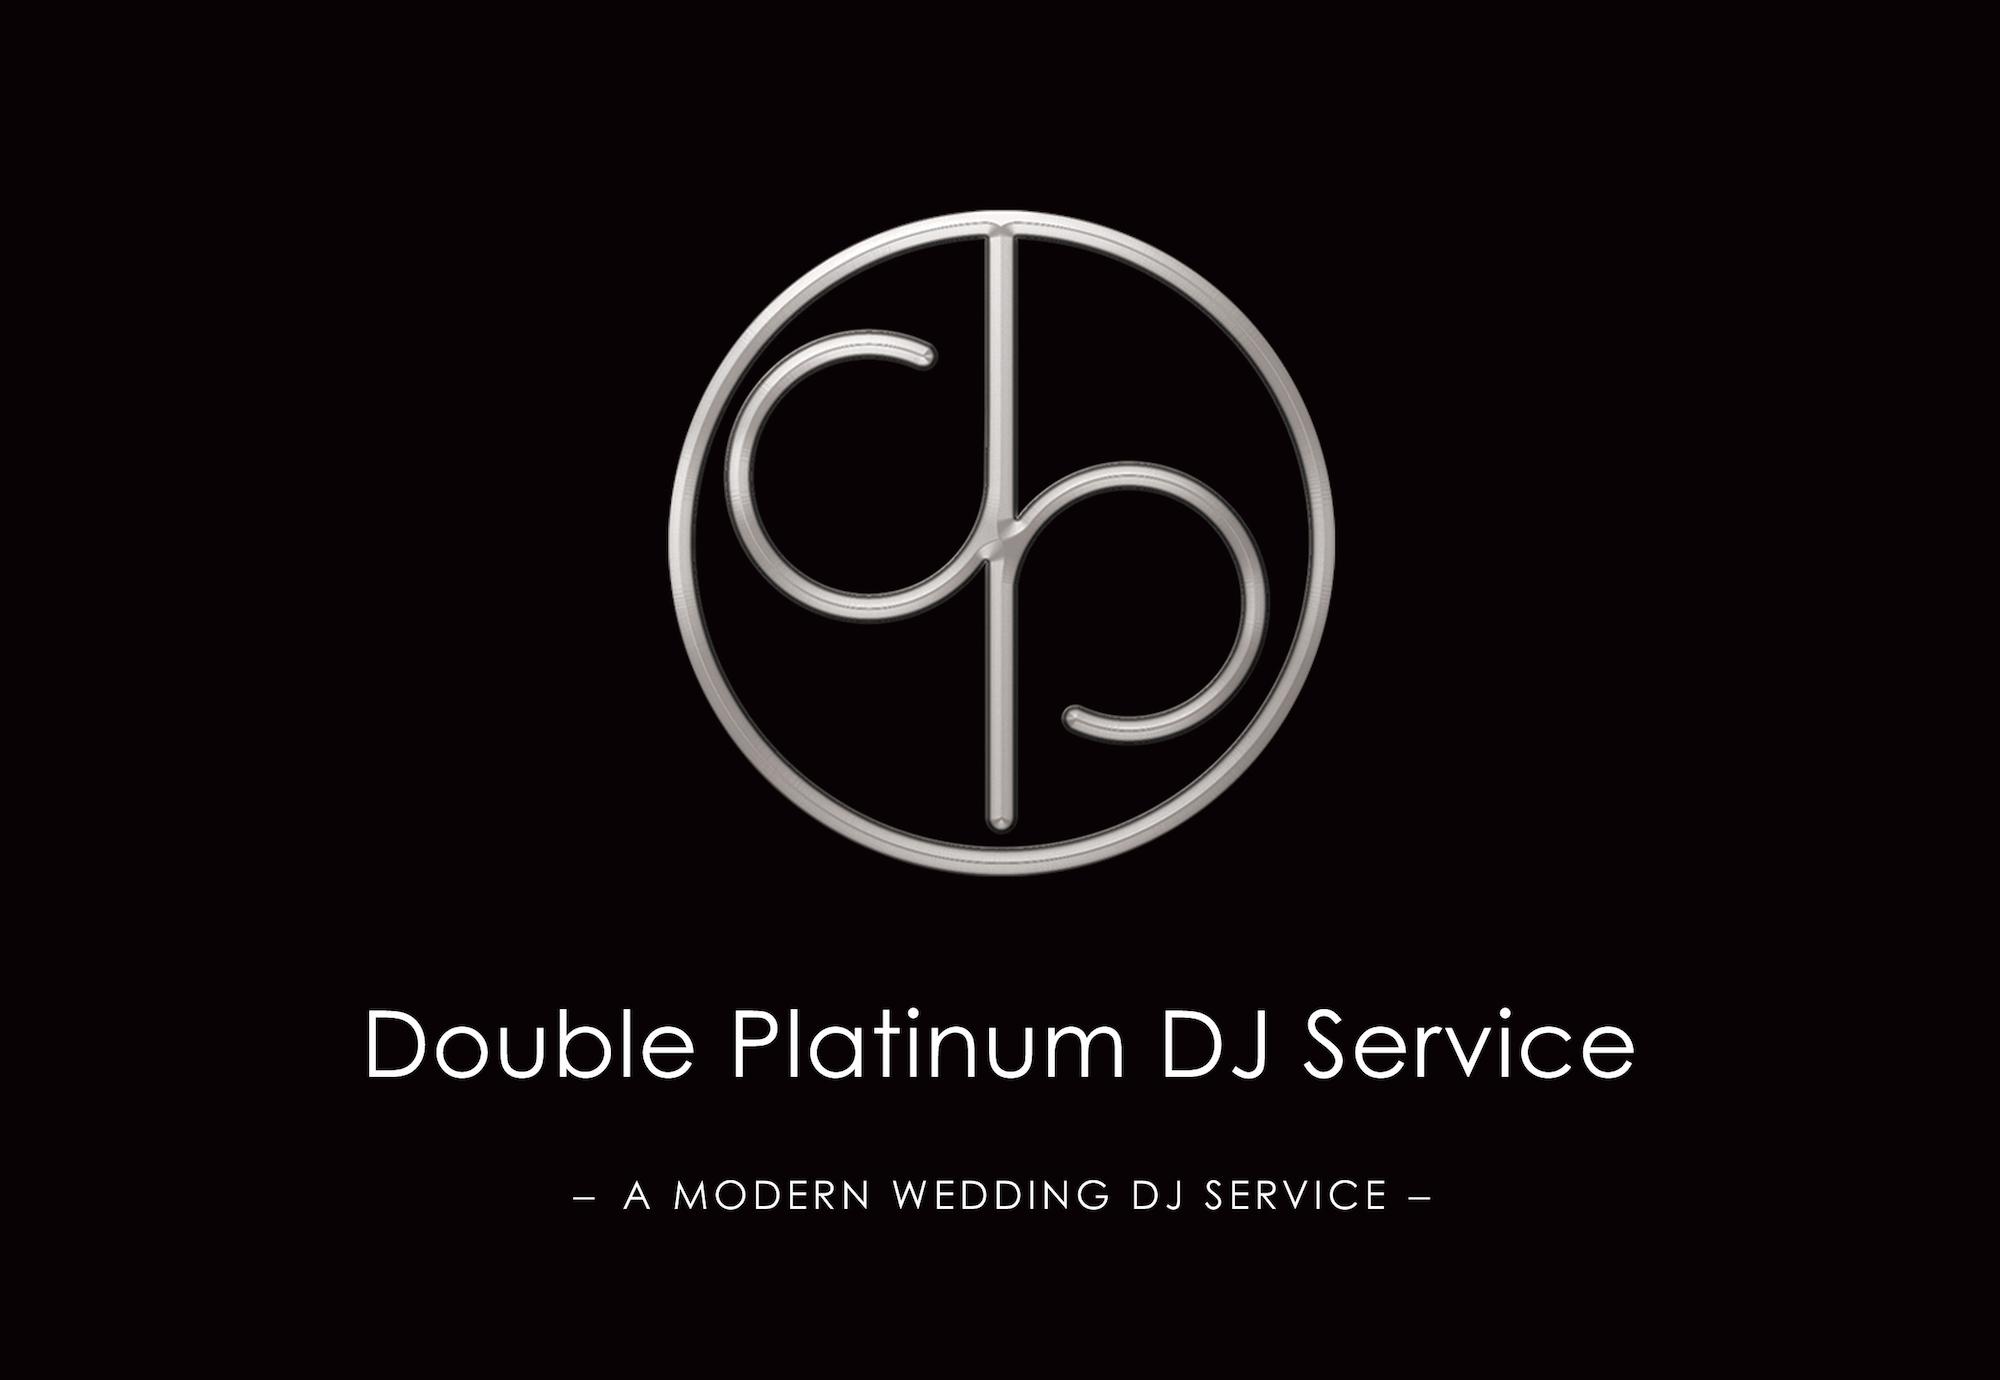 Double Platinum DJ Service